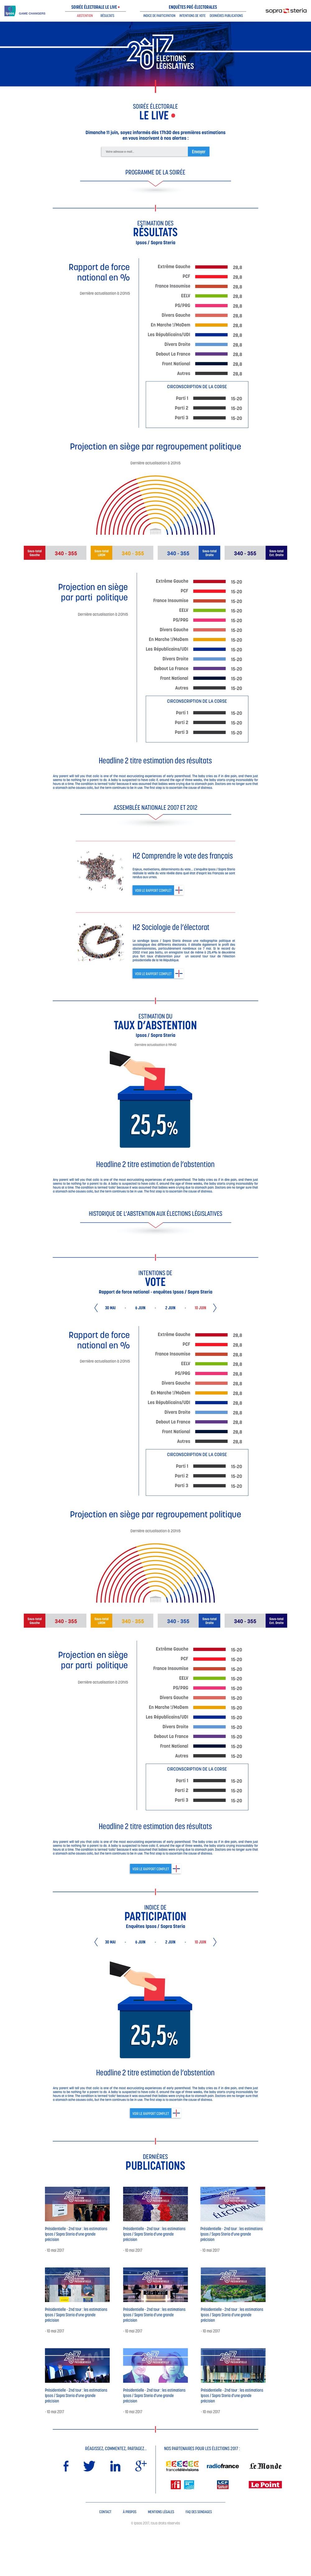 Legislative elections landing page